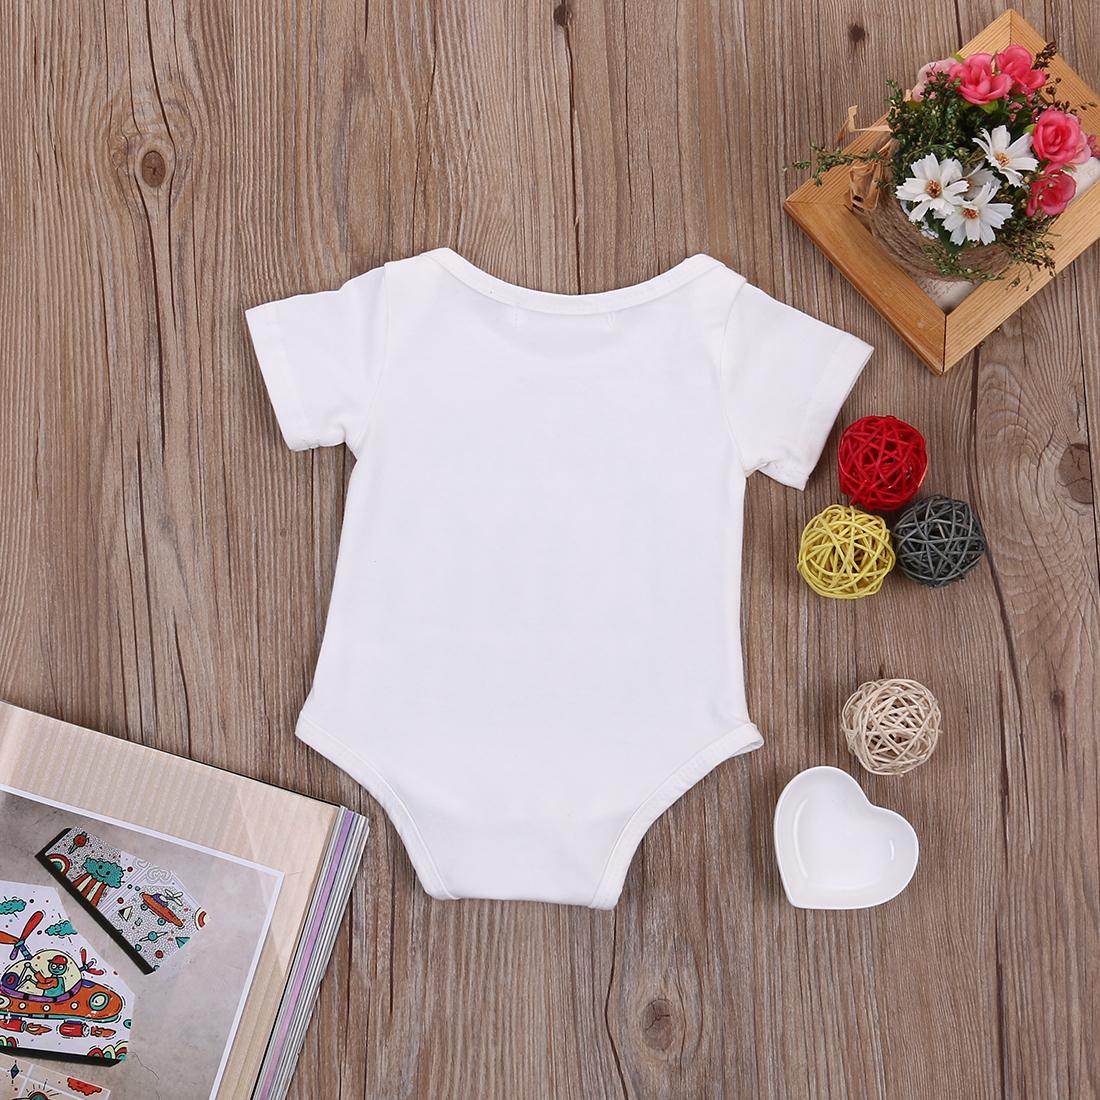 Summer 17 Newborn Kids Baby Girl Boy Clothes Quote Bodysuit Jumpsuit Playsuit Outfit Set 6